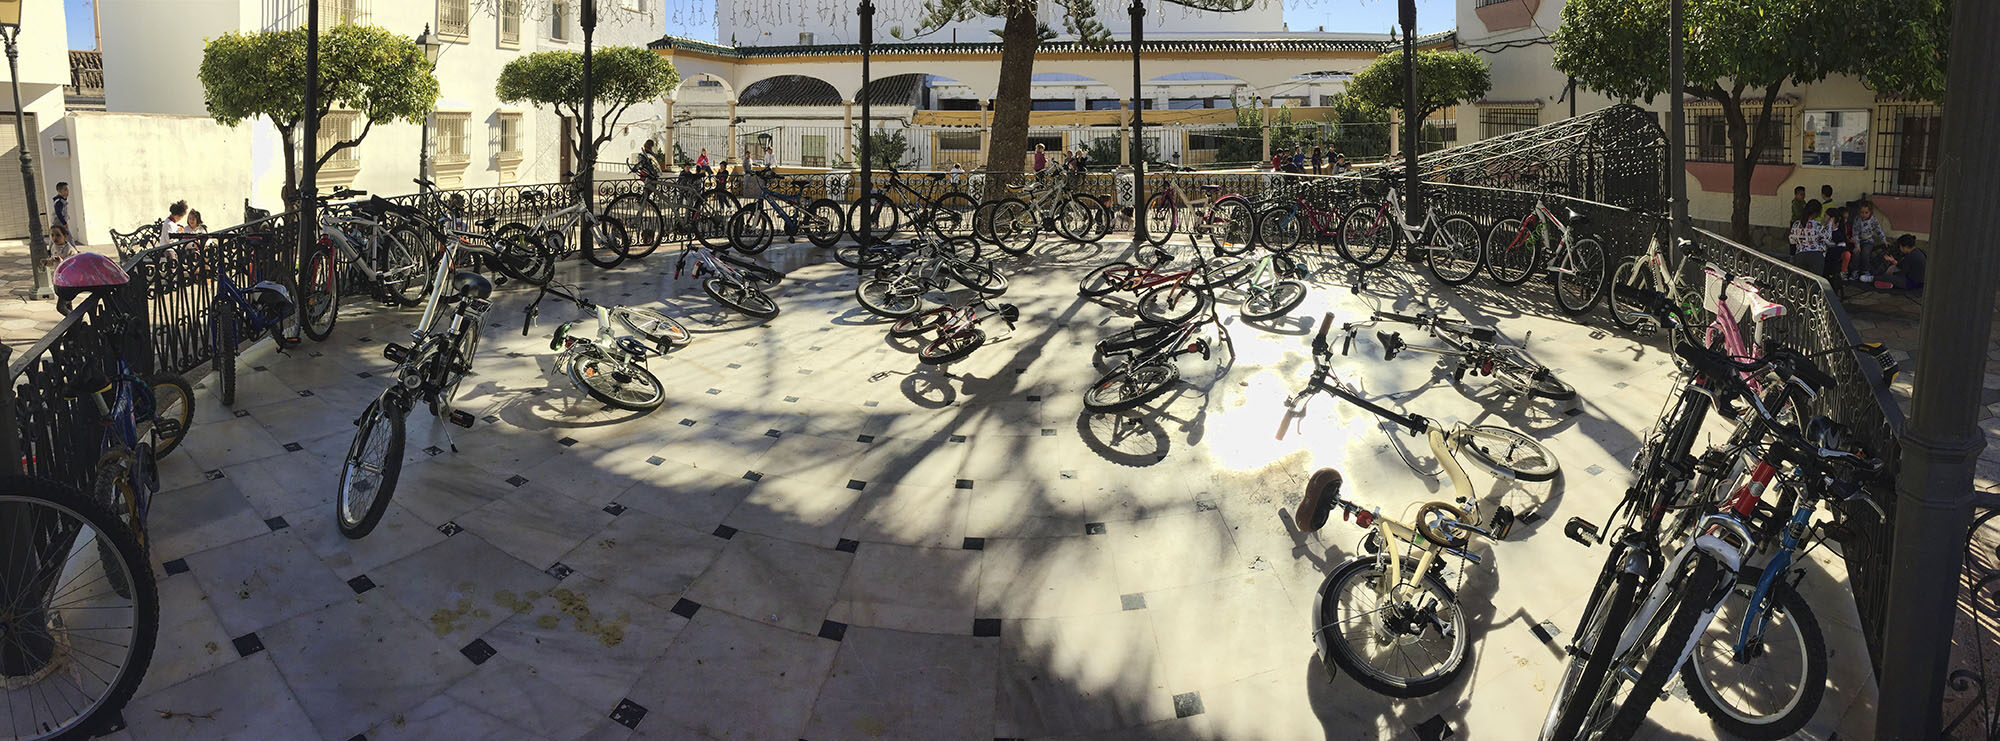 Estepona, Plaza del Reloj